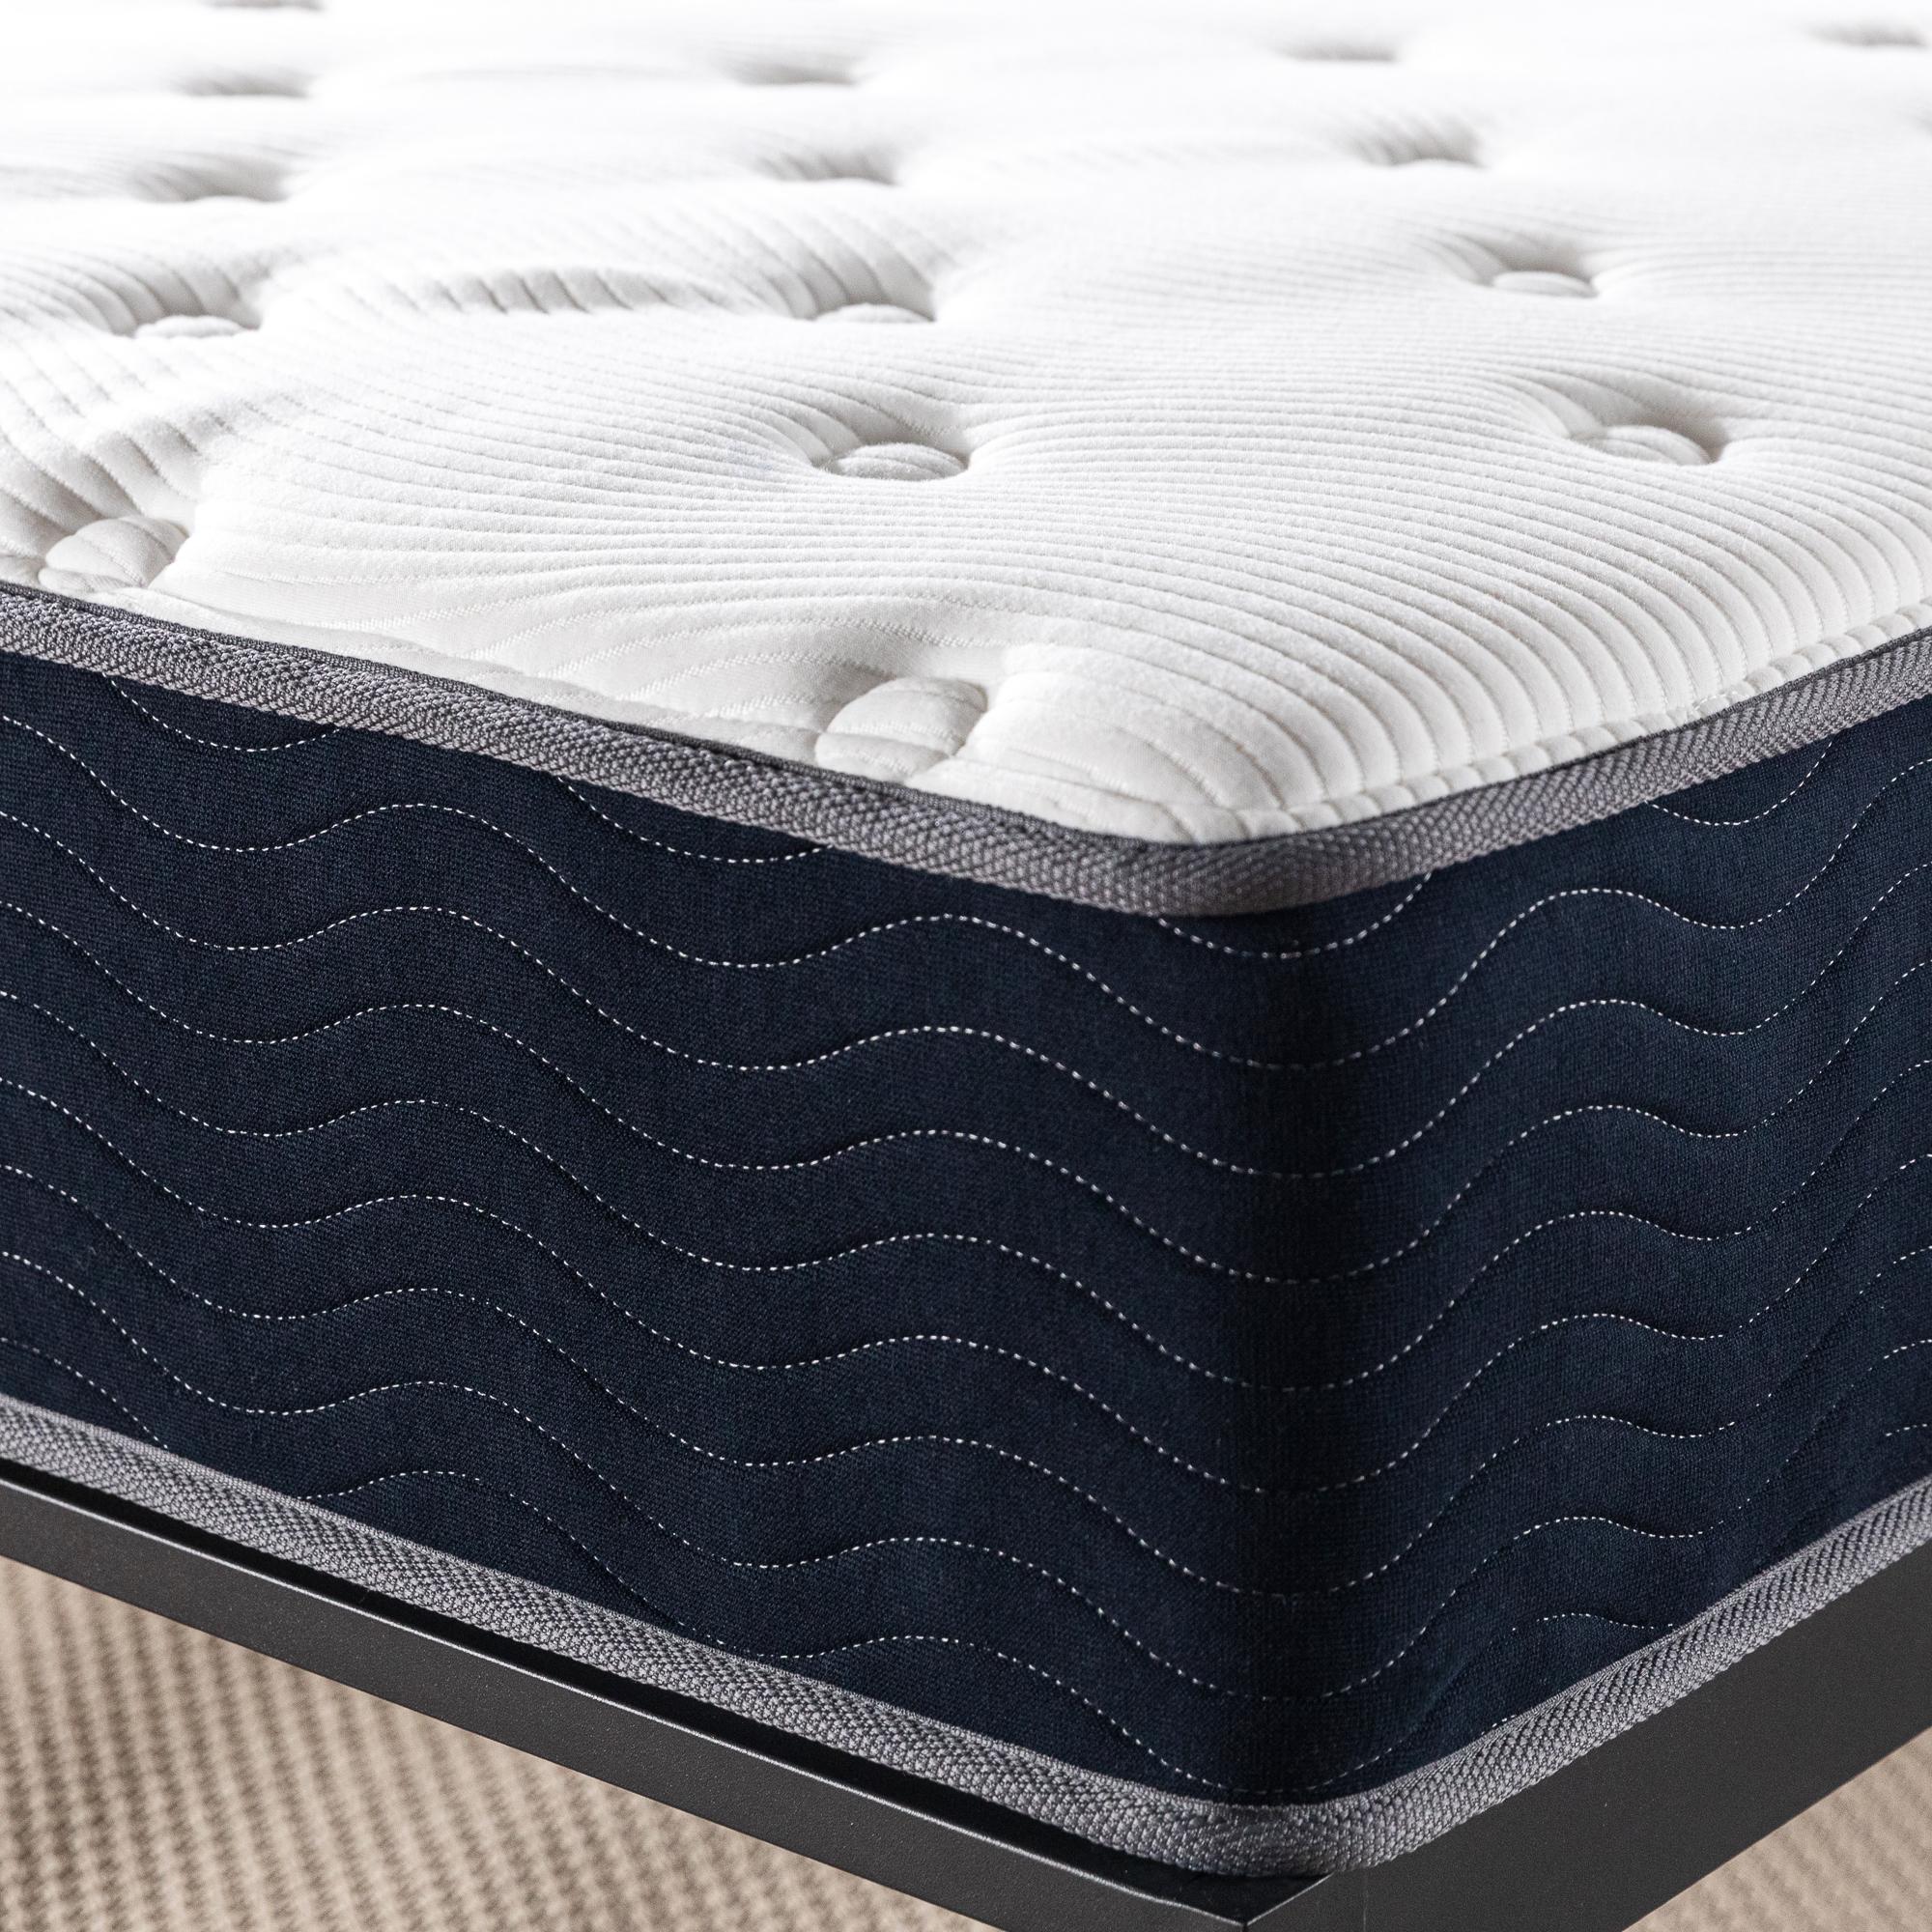 thumbnail 114 - Zinus Mattress Queen Double King Single Bed Memory Foam Pocket Spring Hybrid